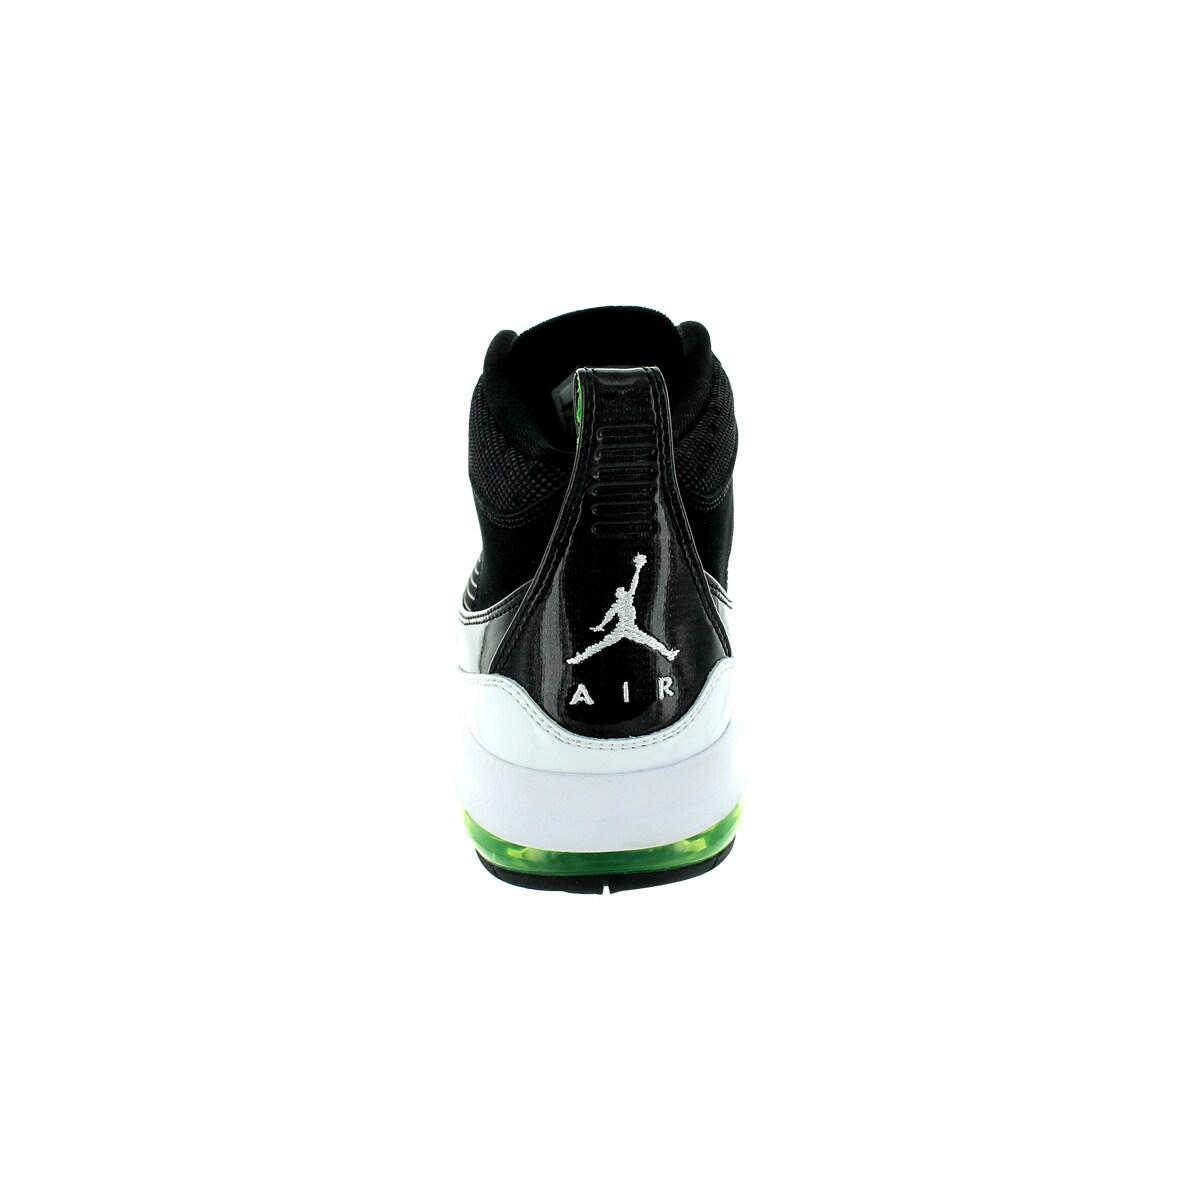 official photos 601ba 2179e Shop Nike Jordan Flight 9 Max Rst Basketball Shoe - Free Shipping Today -  Overstock - 12320994